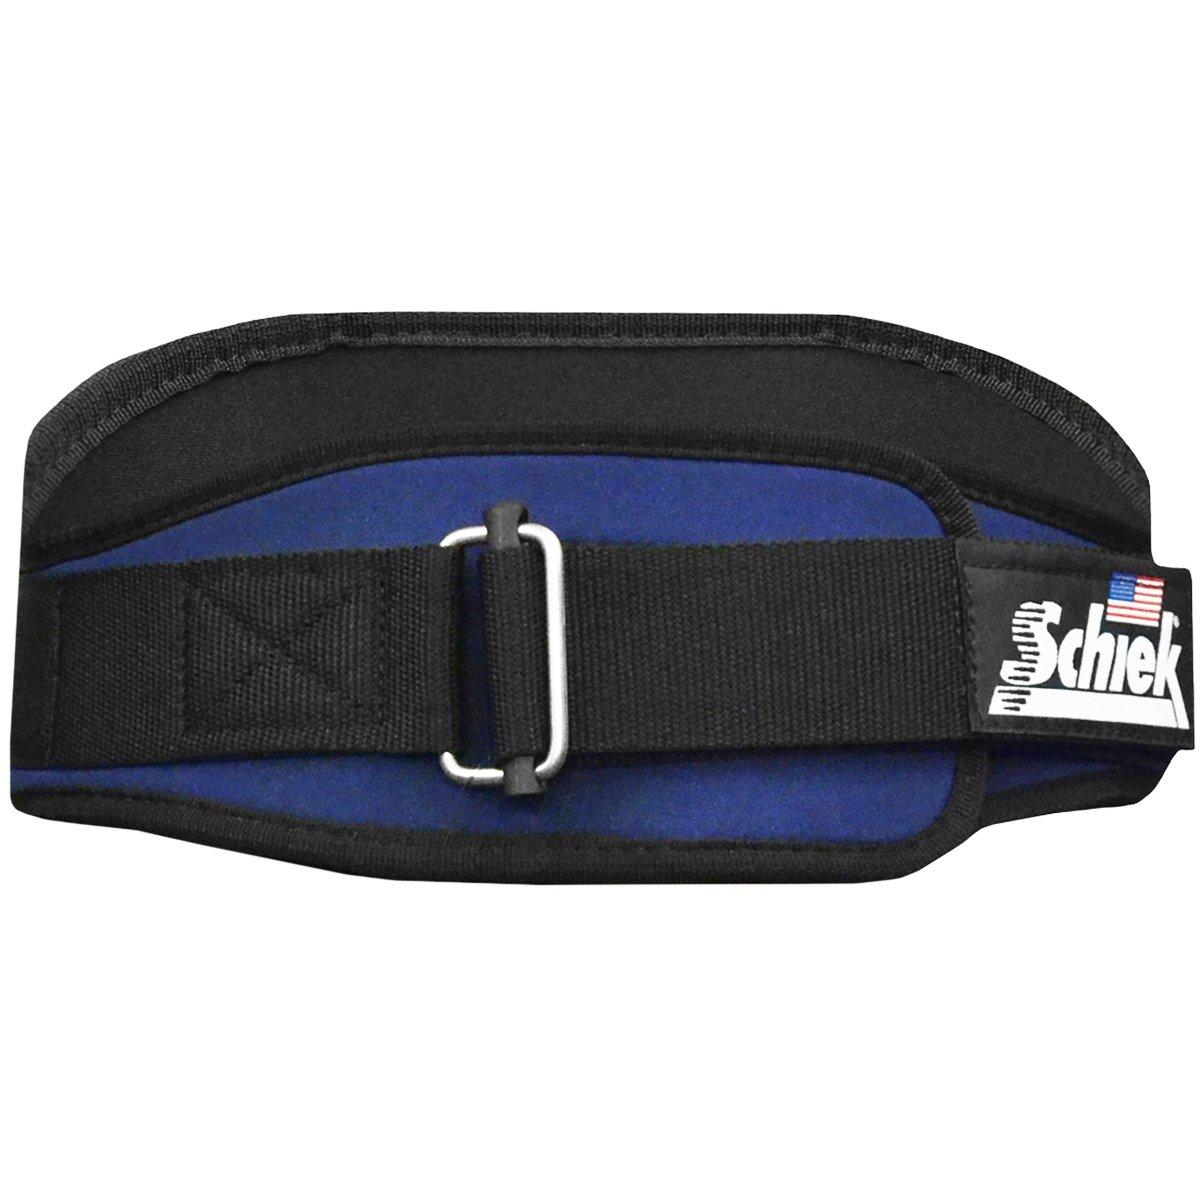 Schiek Sports Schiek Nylon Lifting Belt - 6 inch Size: Large Light Navy